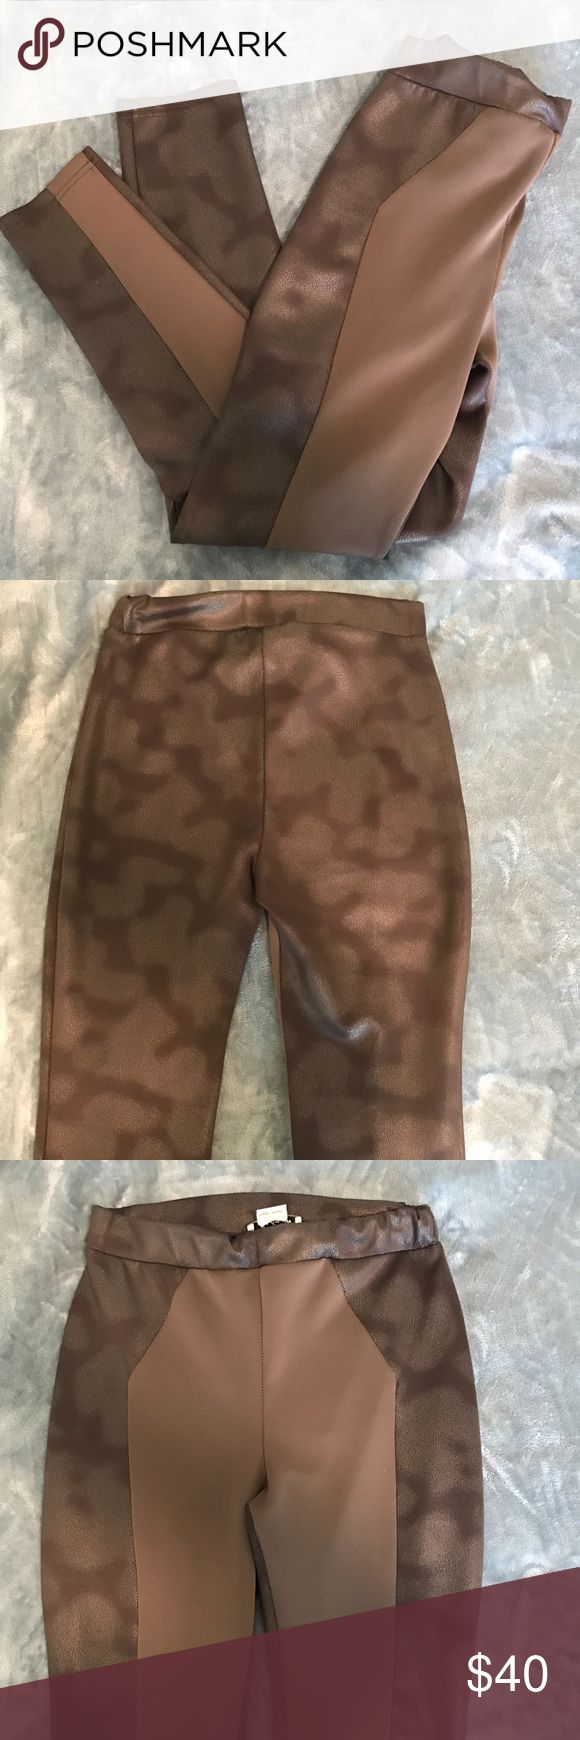 Jus d'Orange brown legging pants for size 29 Jus d'Orange legging pants in brown extremely comfortable material gentle use looks brand new Pants Skinny